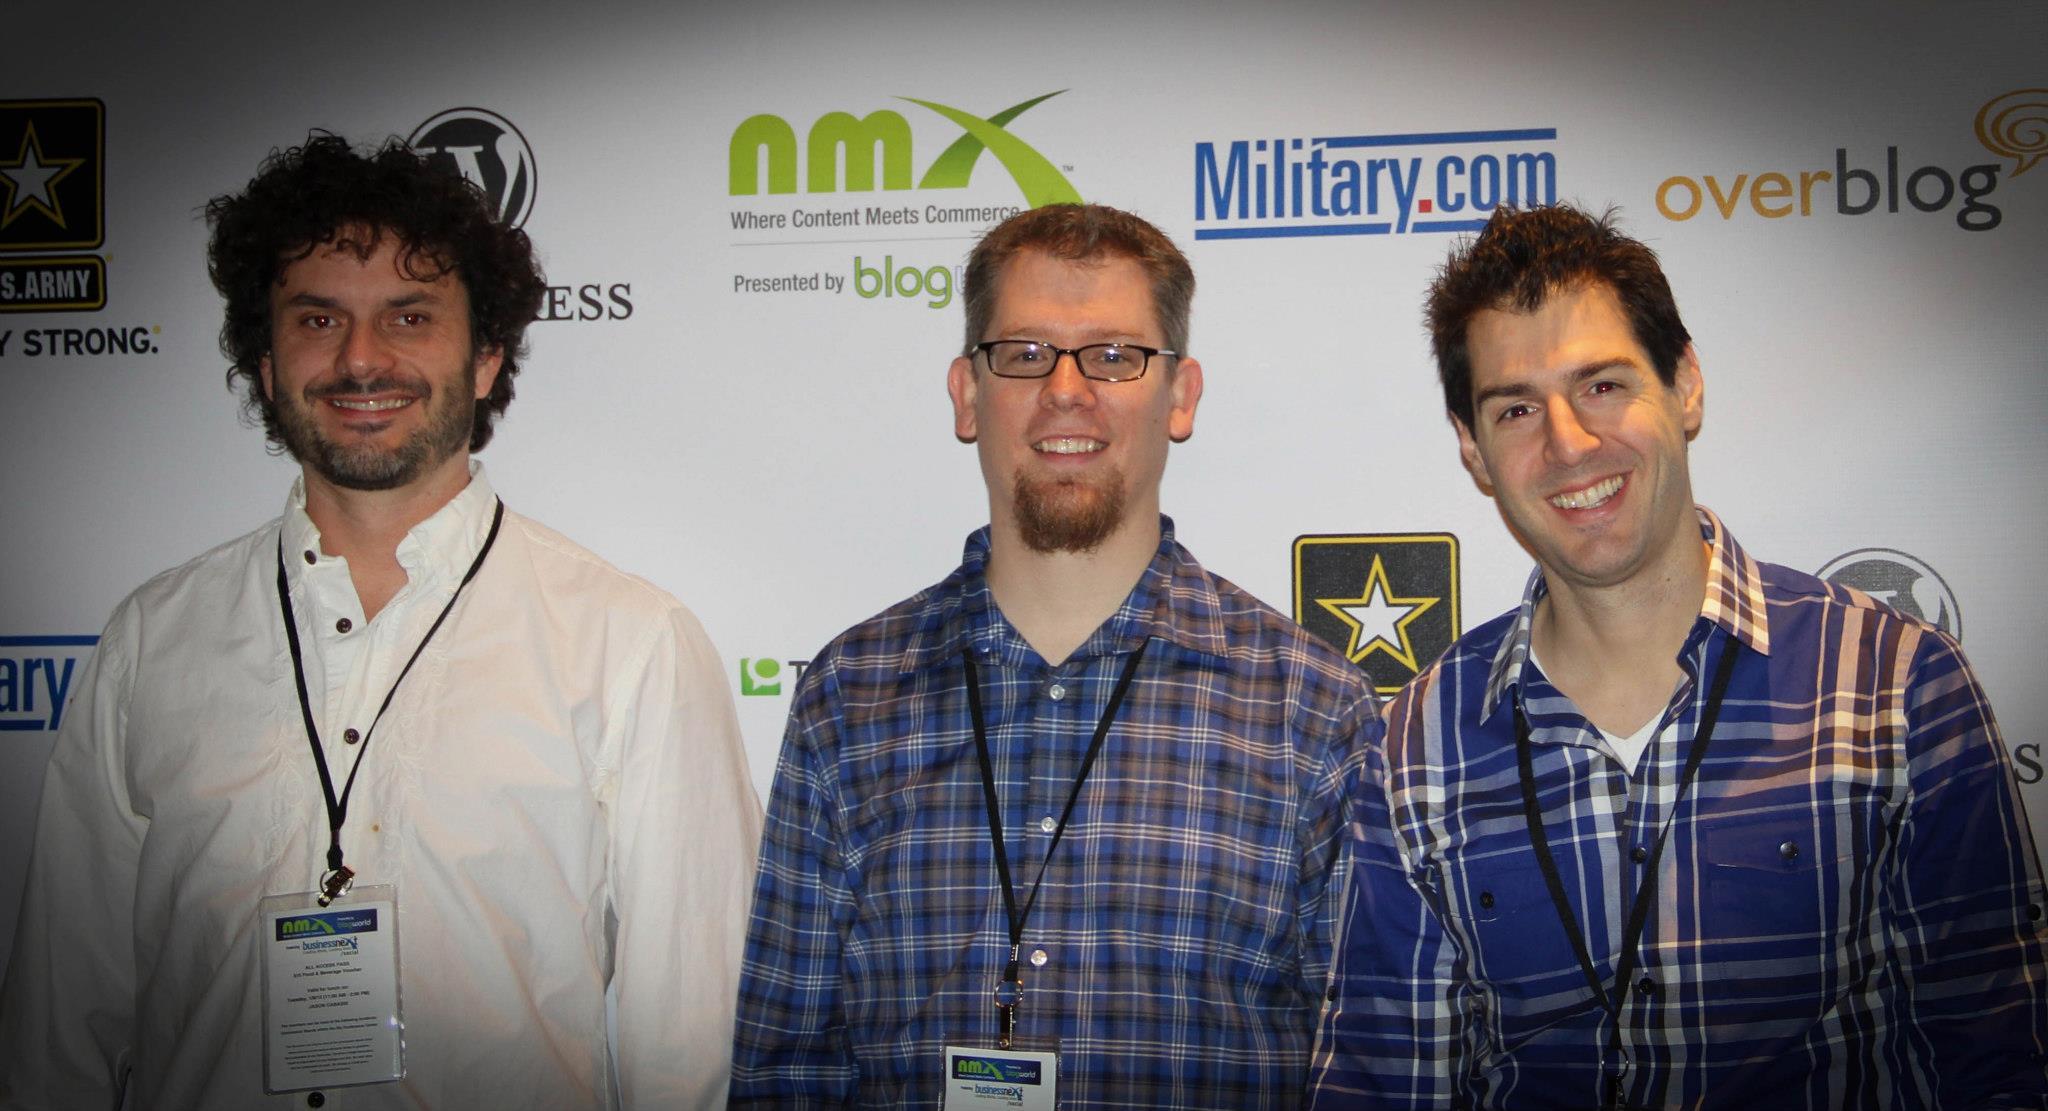 Jason Cabassi (The Walking Deadcast), Darrell Darnell (The Fringe Podcast) & Rob Cesternino (Rob Has a Podcast)